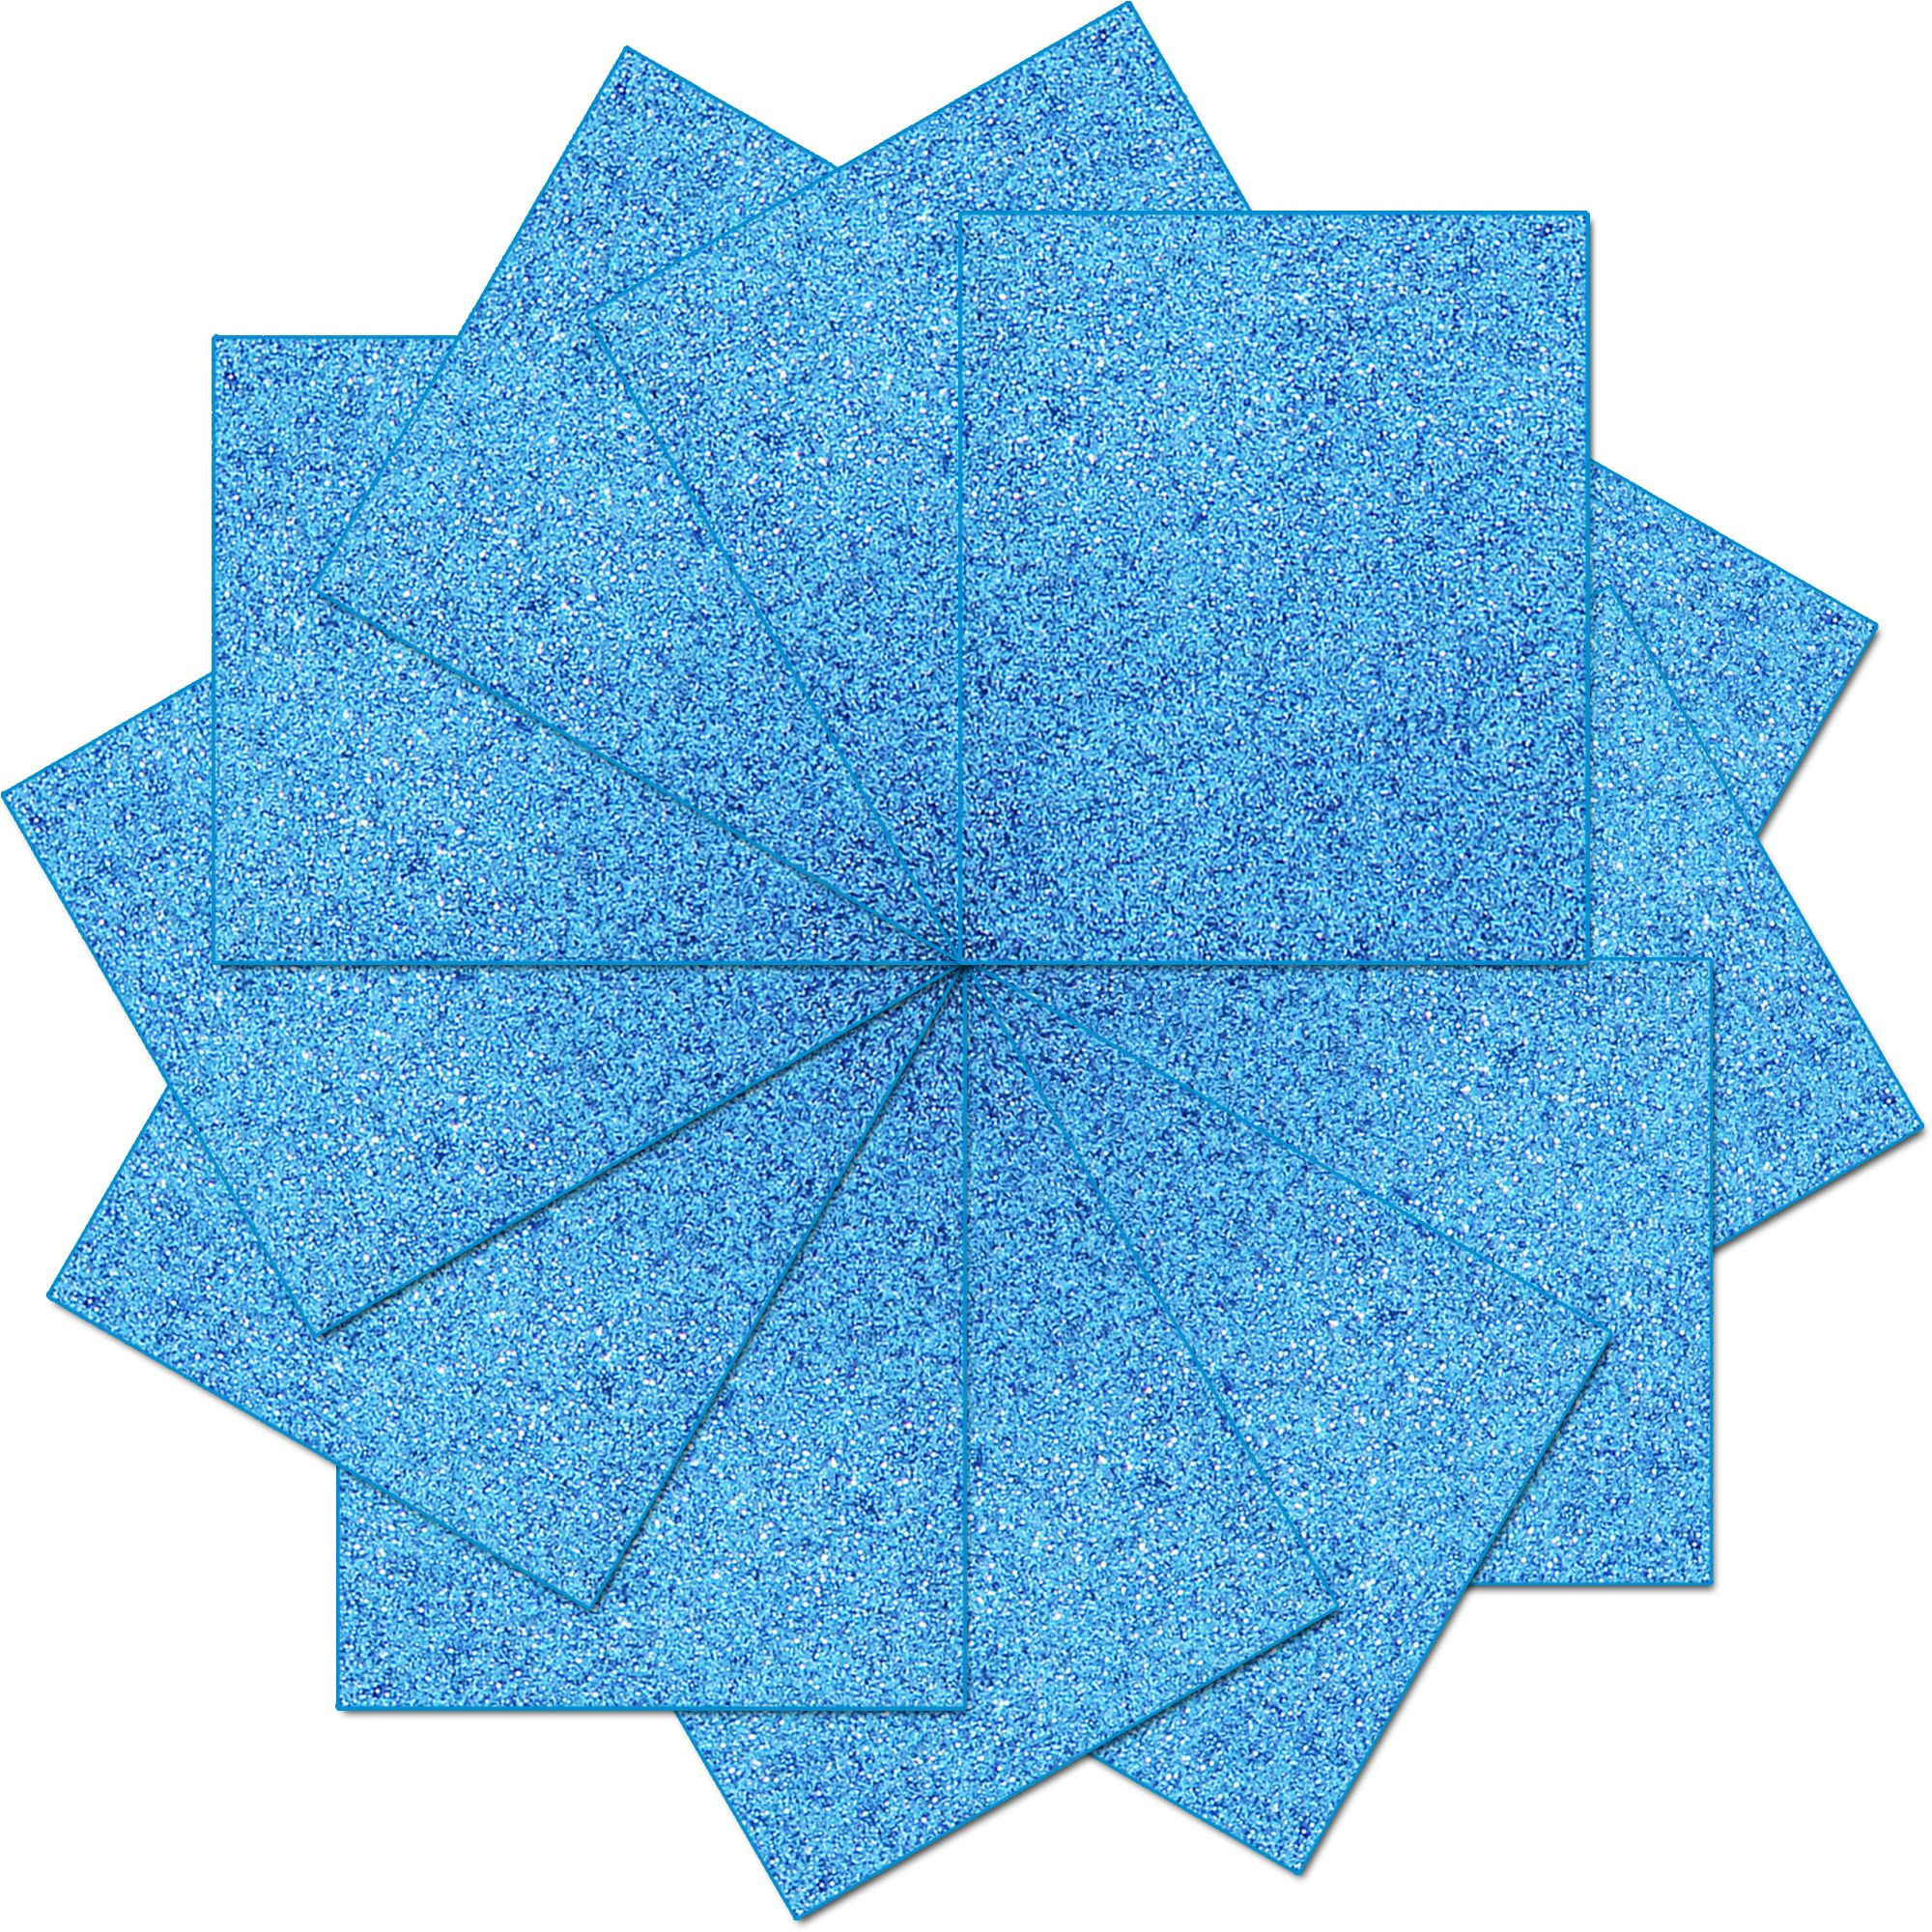 "Threadart Variety Pack 10"" x 12"" Heat Transfer Glitter Color Vinyl Precut Sheets - 12 Sheets"